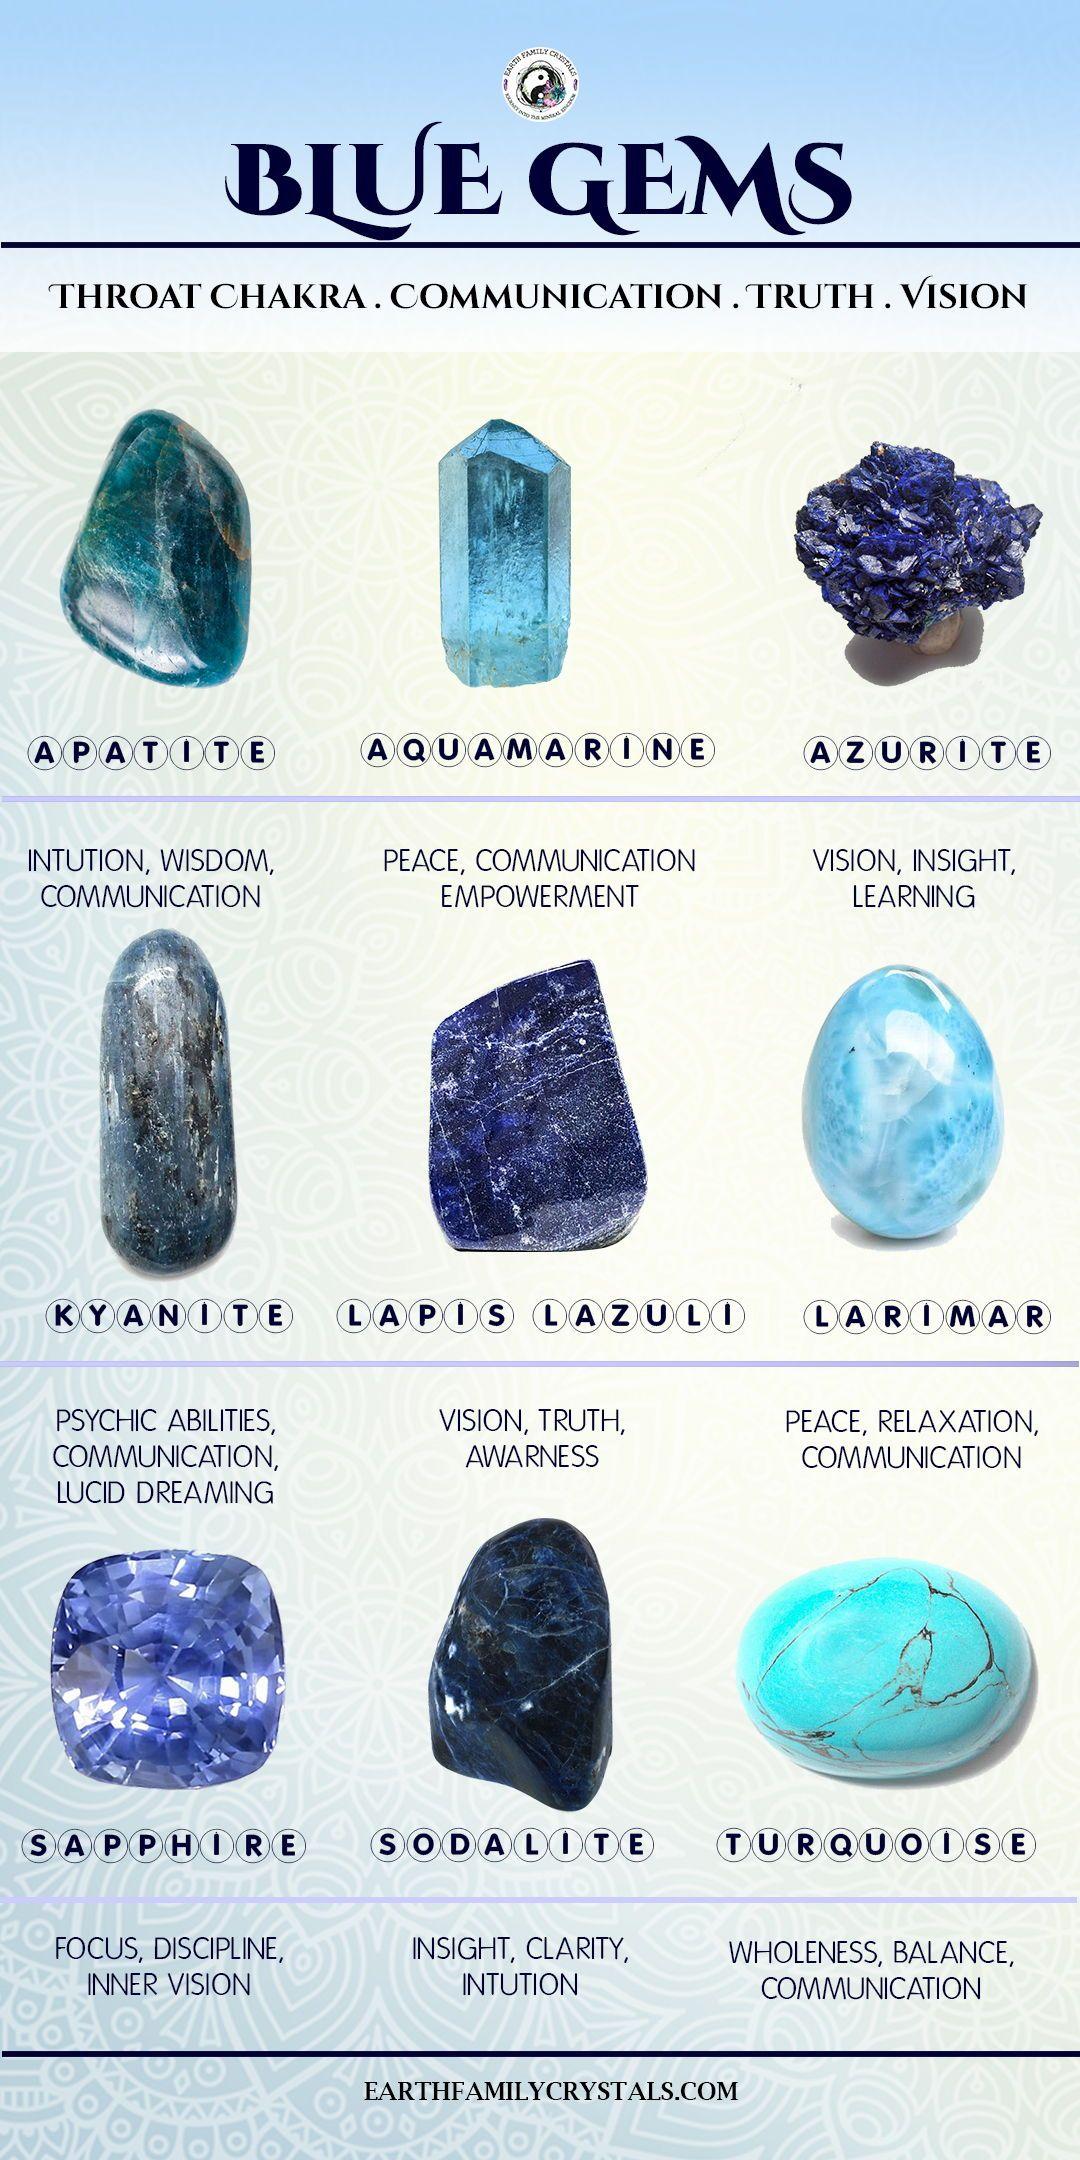 Crystals Gemstone Jewelry Unique Gift Ideas Gemstone Healing Crystal Healing Stones Spiritual Crystals